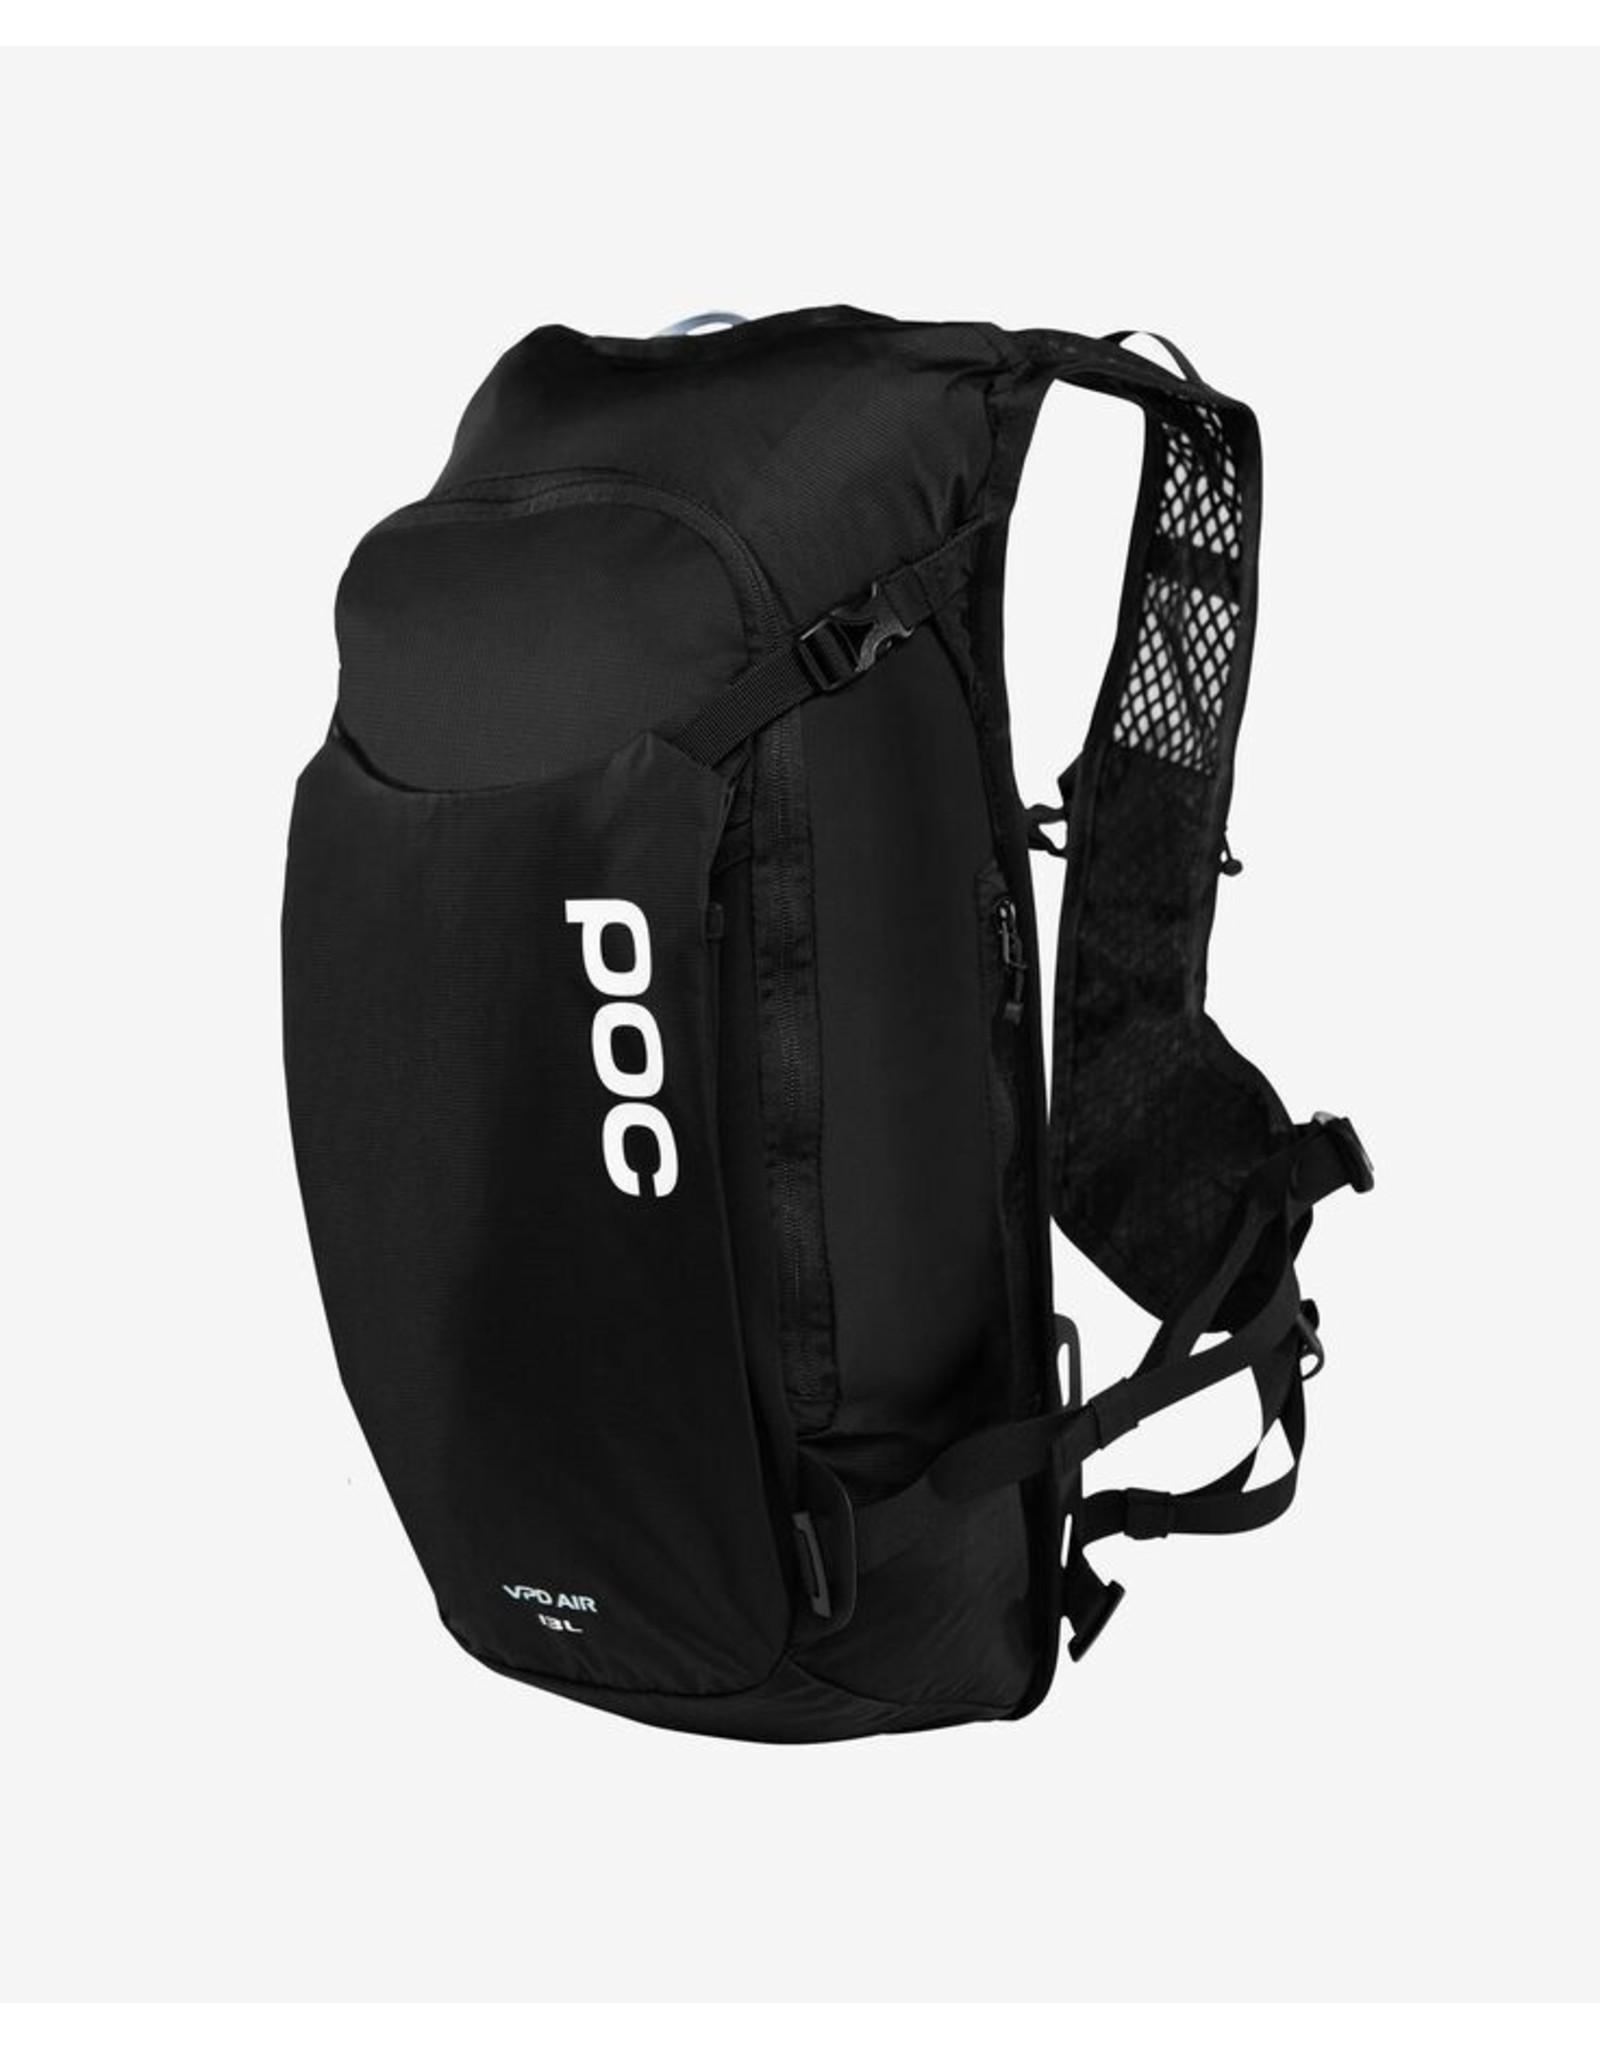 POC POC Spine VPD Air Backpack 13L